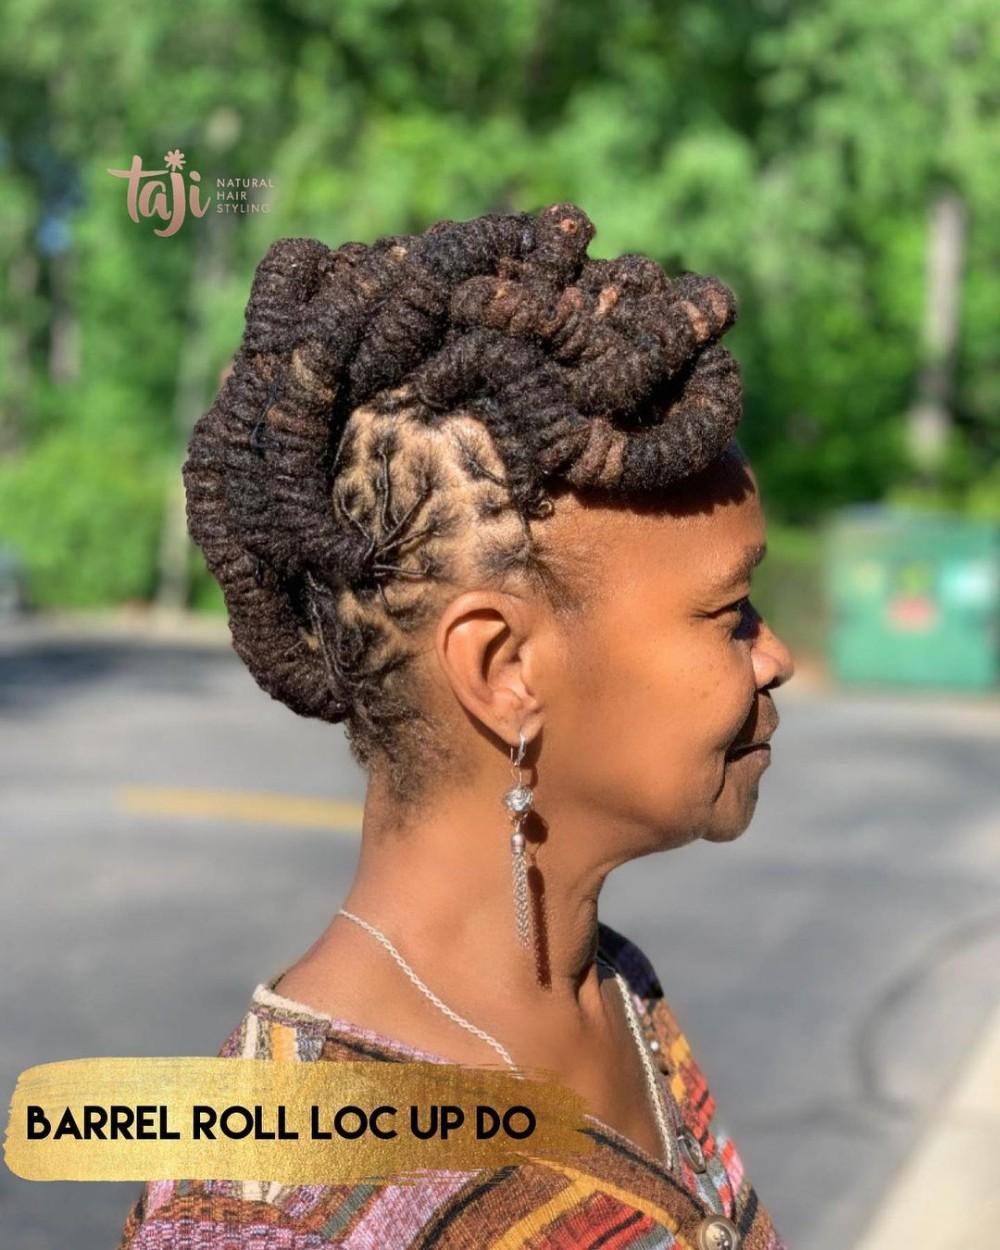 Taji Natural Hair Styling (@tajisalon) • Instagram photos and videos